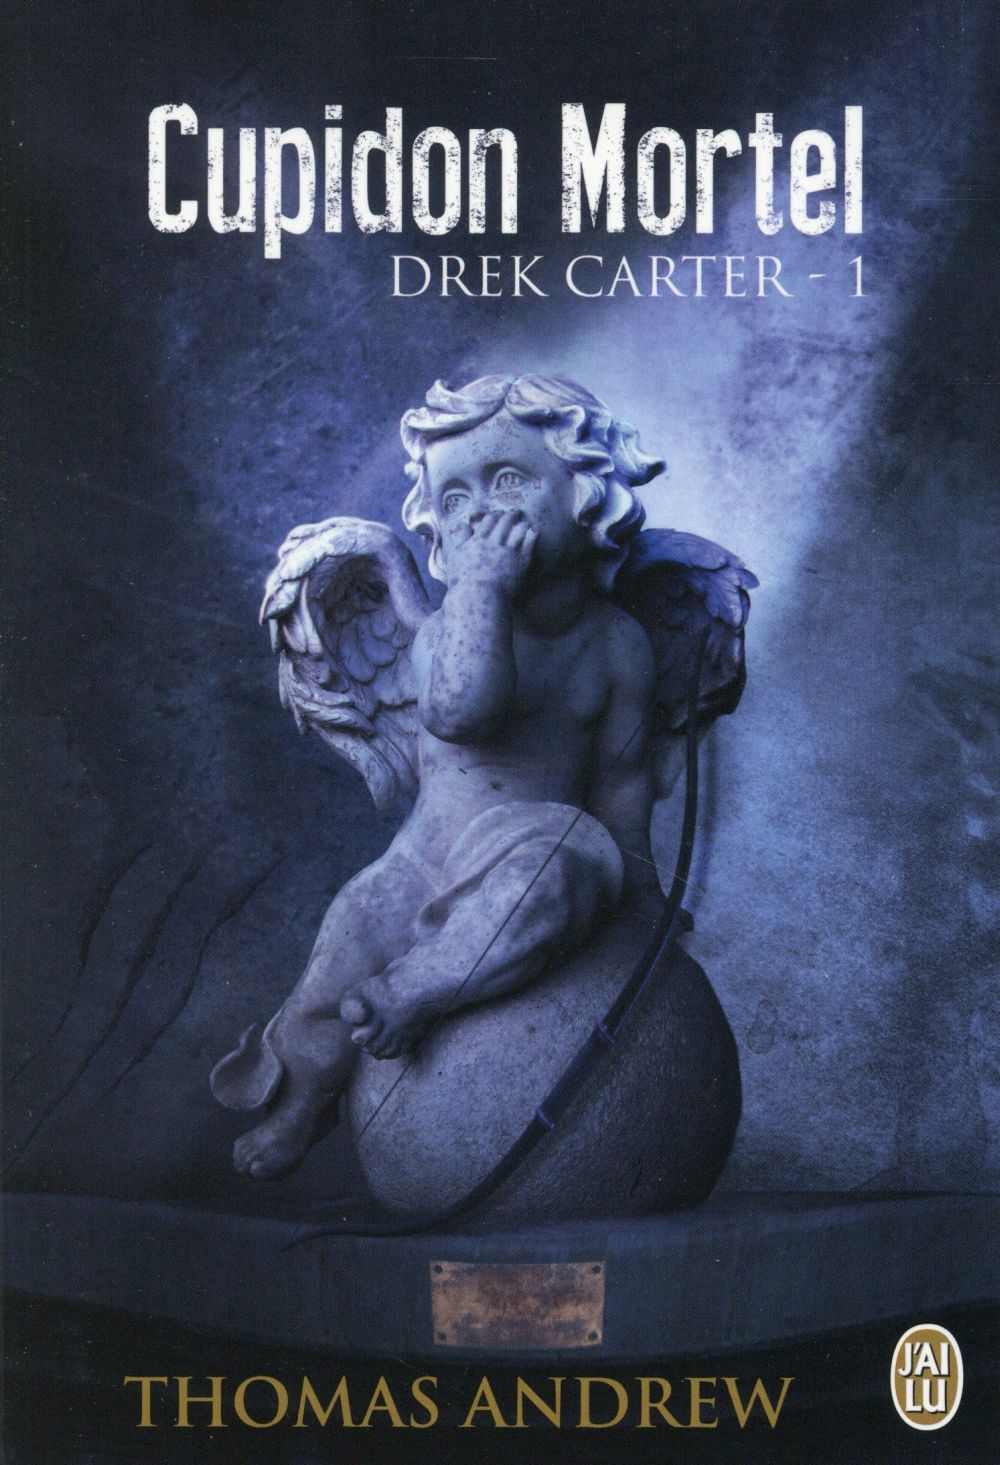 Drek Carter t.1 ; Cupidon mortel